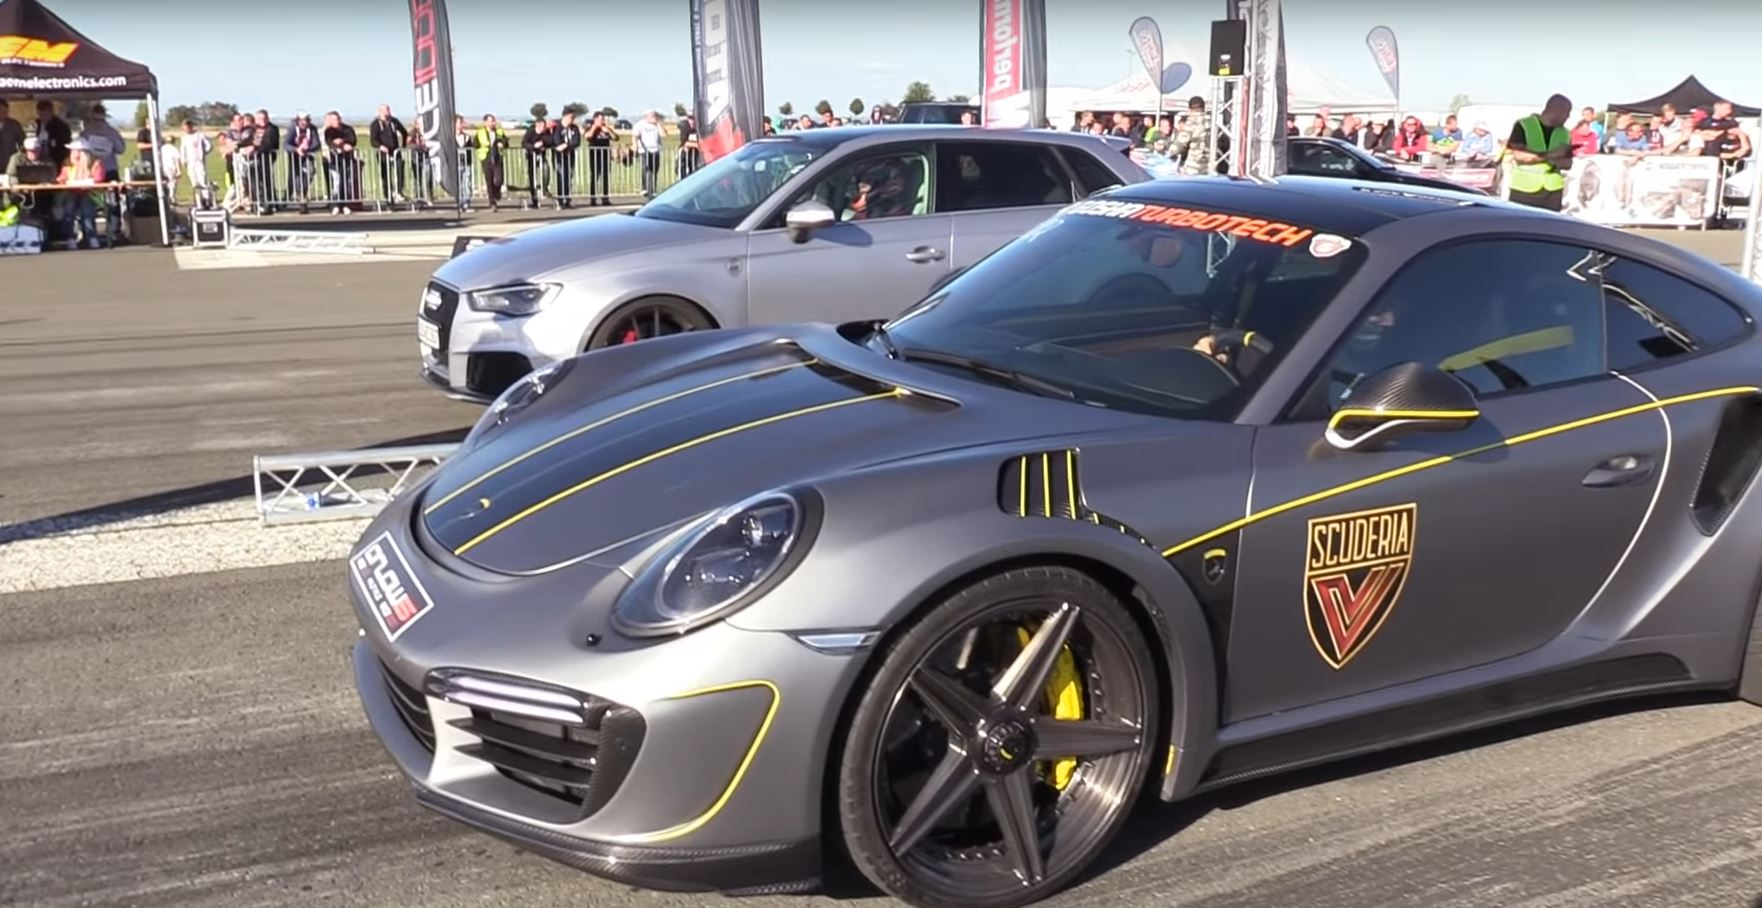 900 Hp Porsche 911 Turbo Races 640 Hp Golf R Gives It A Head Start